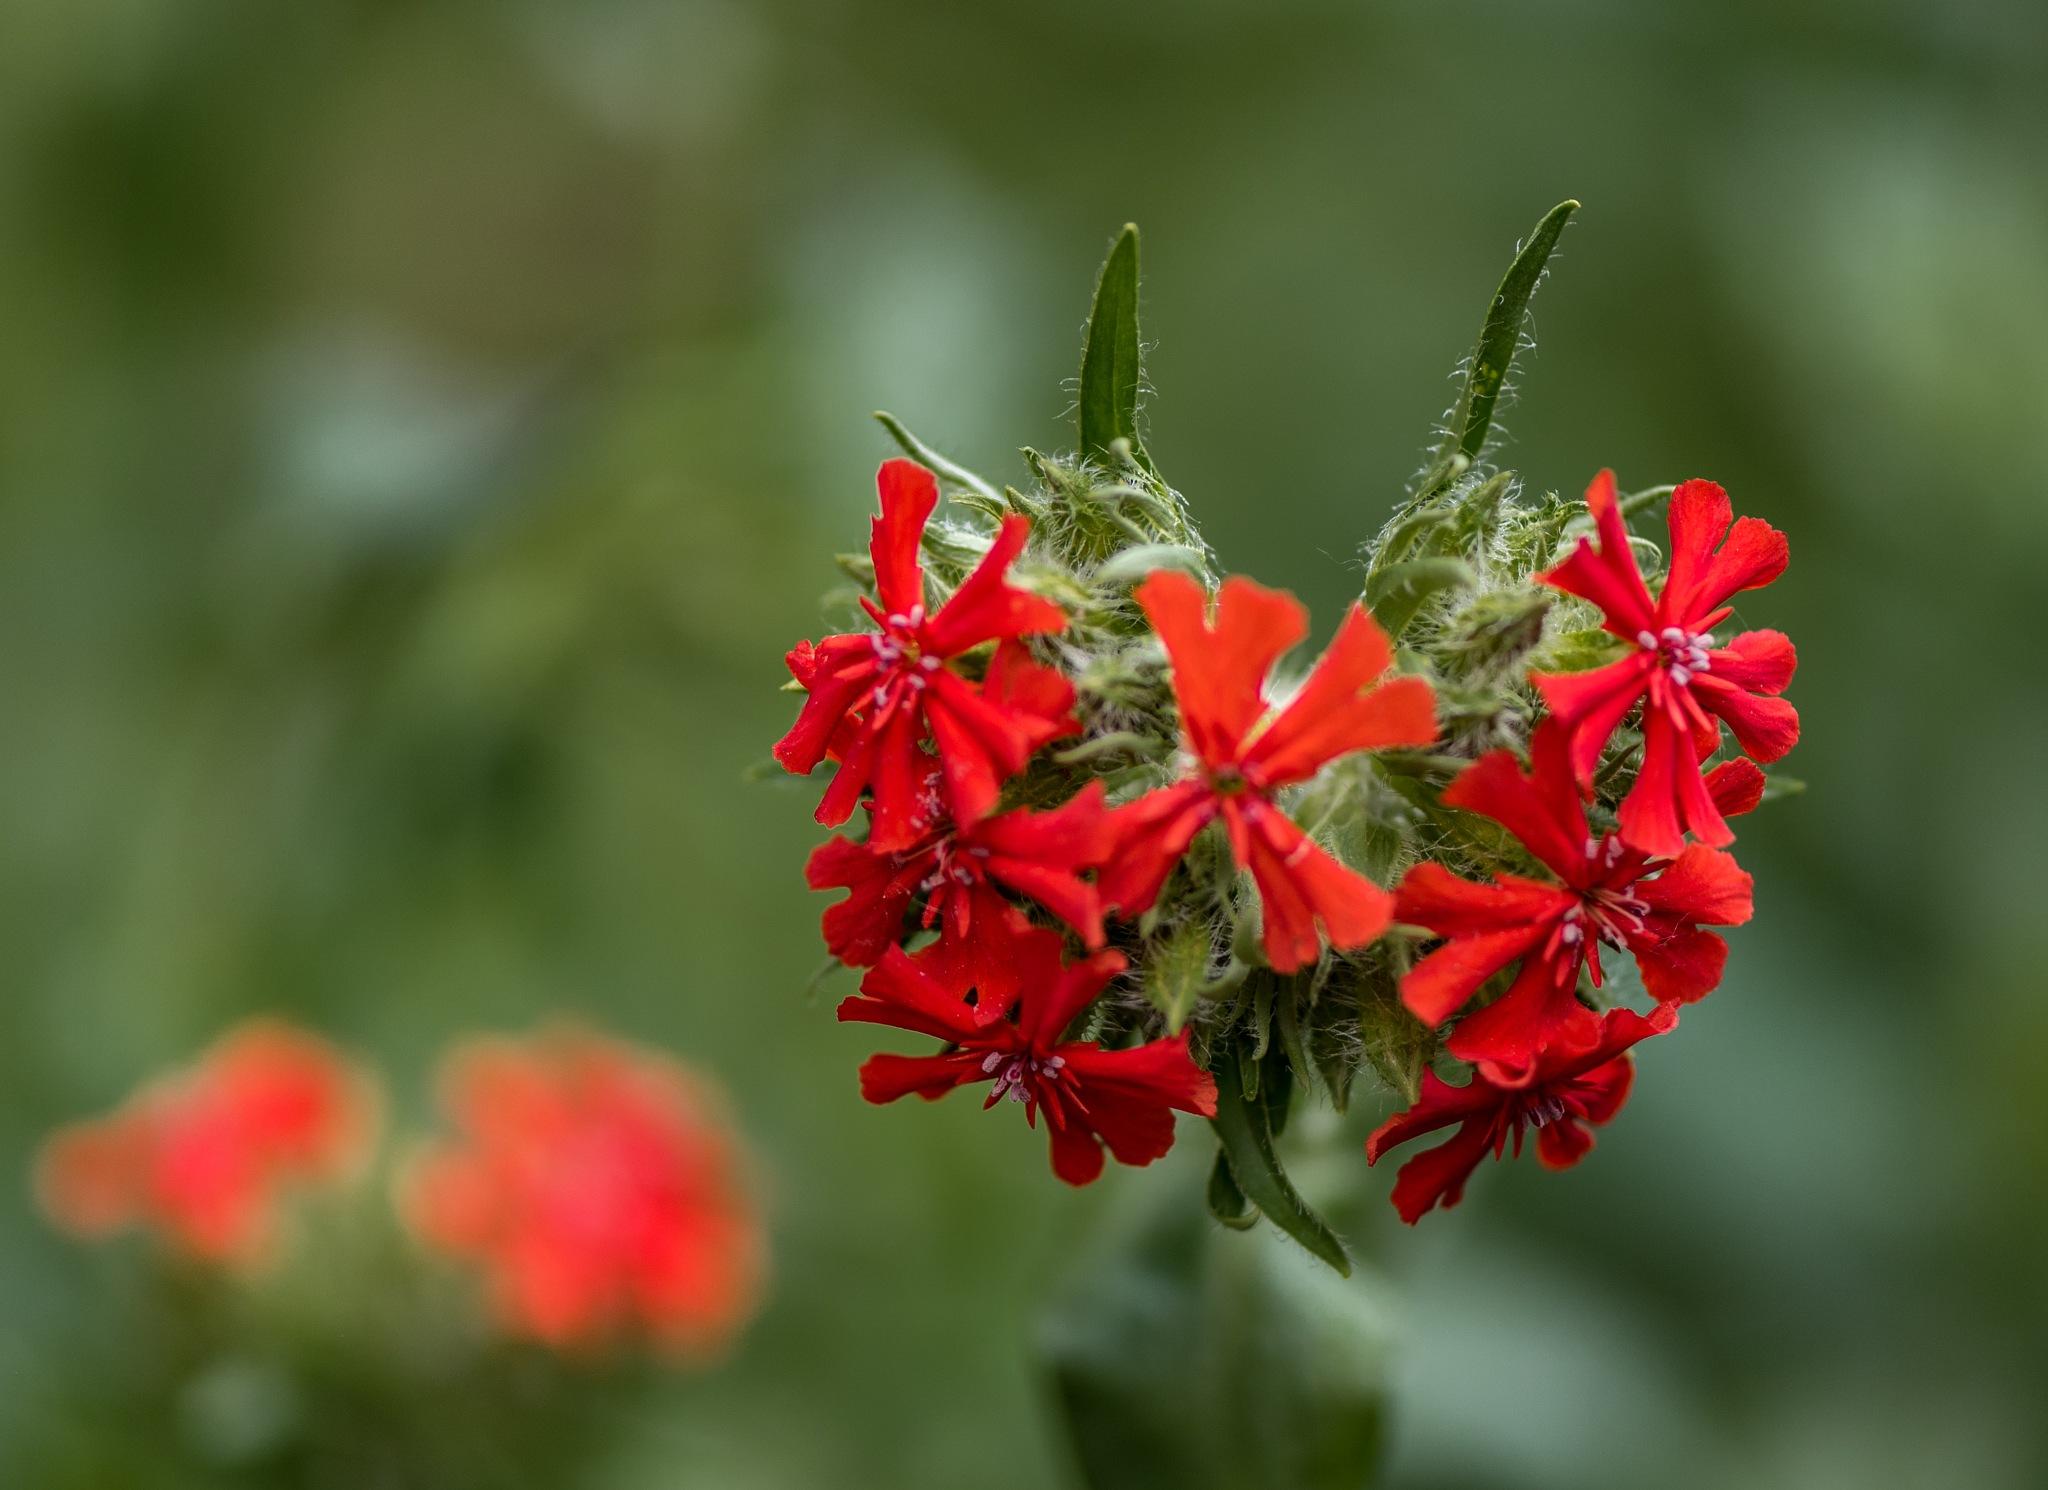 BARB'S GARDEN: RED FLOWERS by DrJohnHodgson